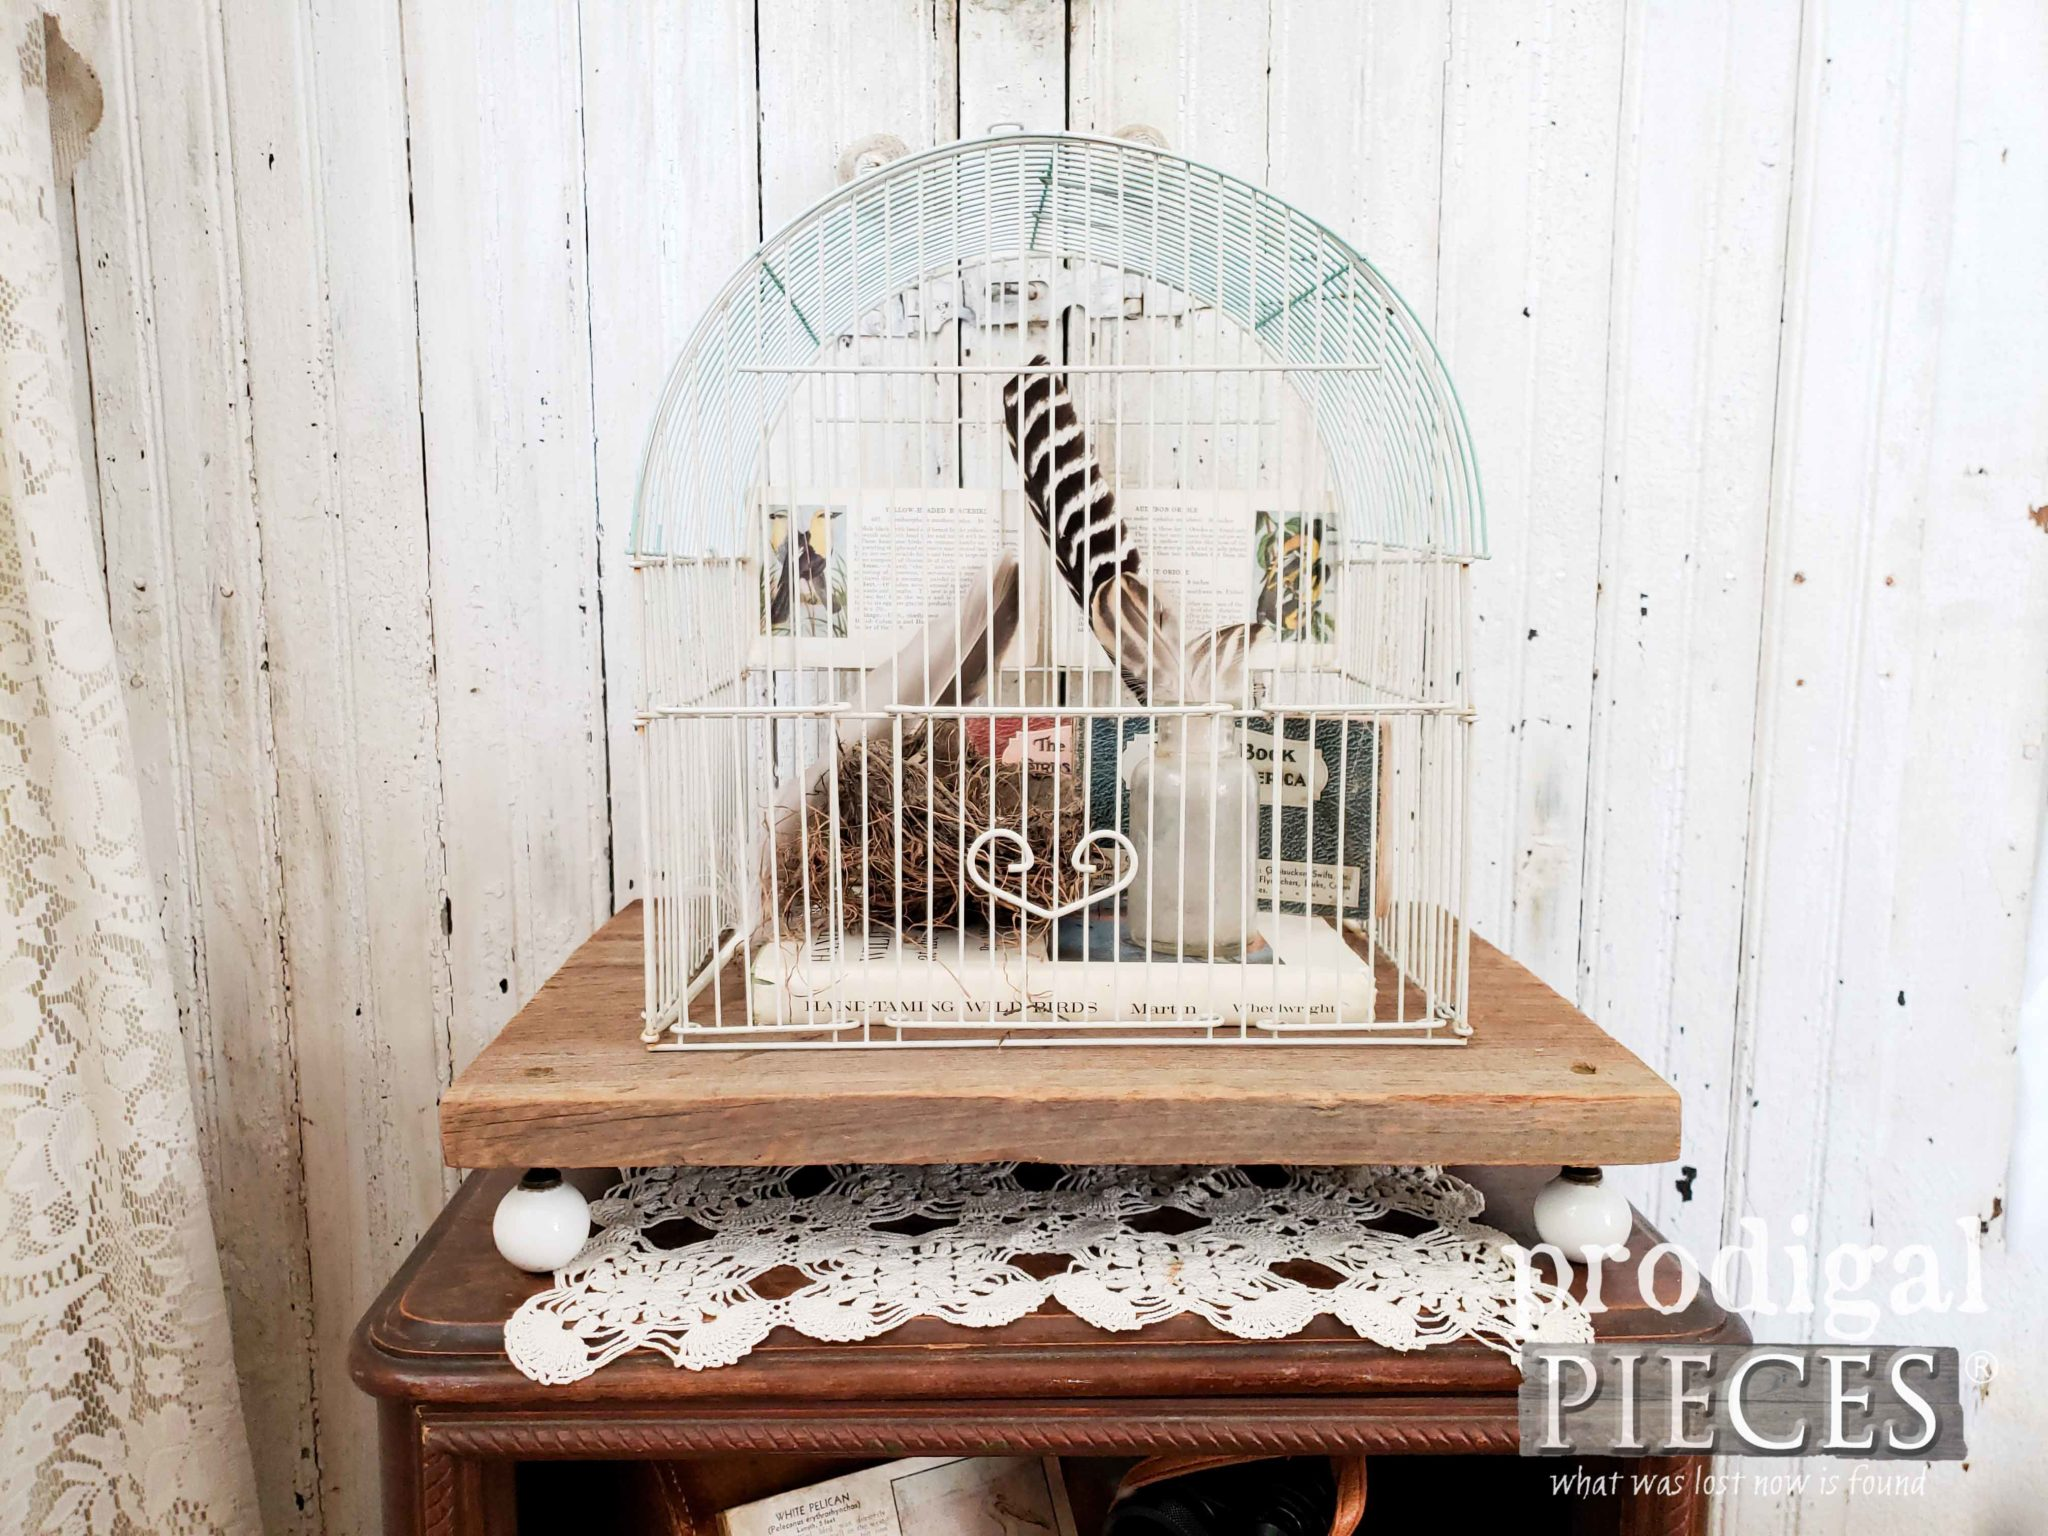 Farmhouse Upcycled Bird Cage Vignette with Birding Paraphernalia by Larissa of Prodigal Pieces | prodigalpieces.com #prodigalpieces #home #farmhouse #birds #homedecor #diy